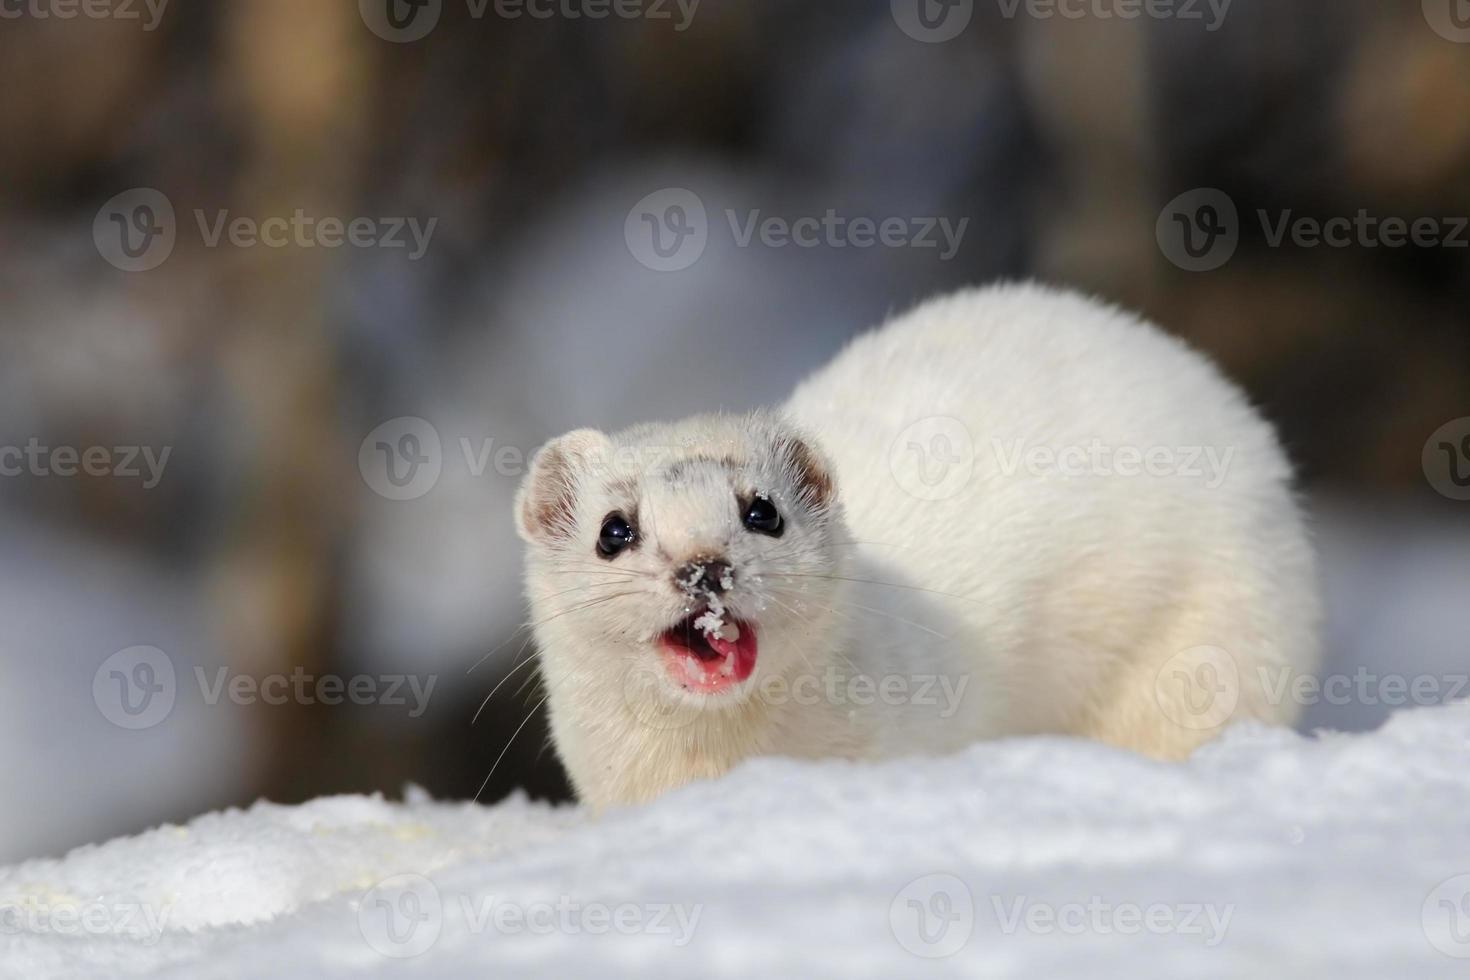 Winter Least Weasel eating photo